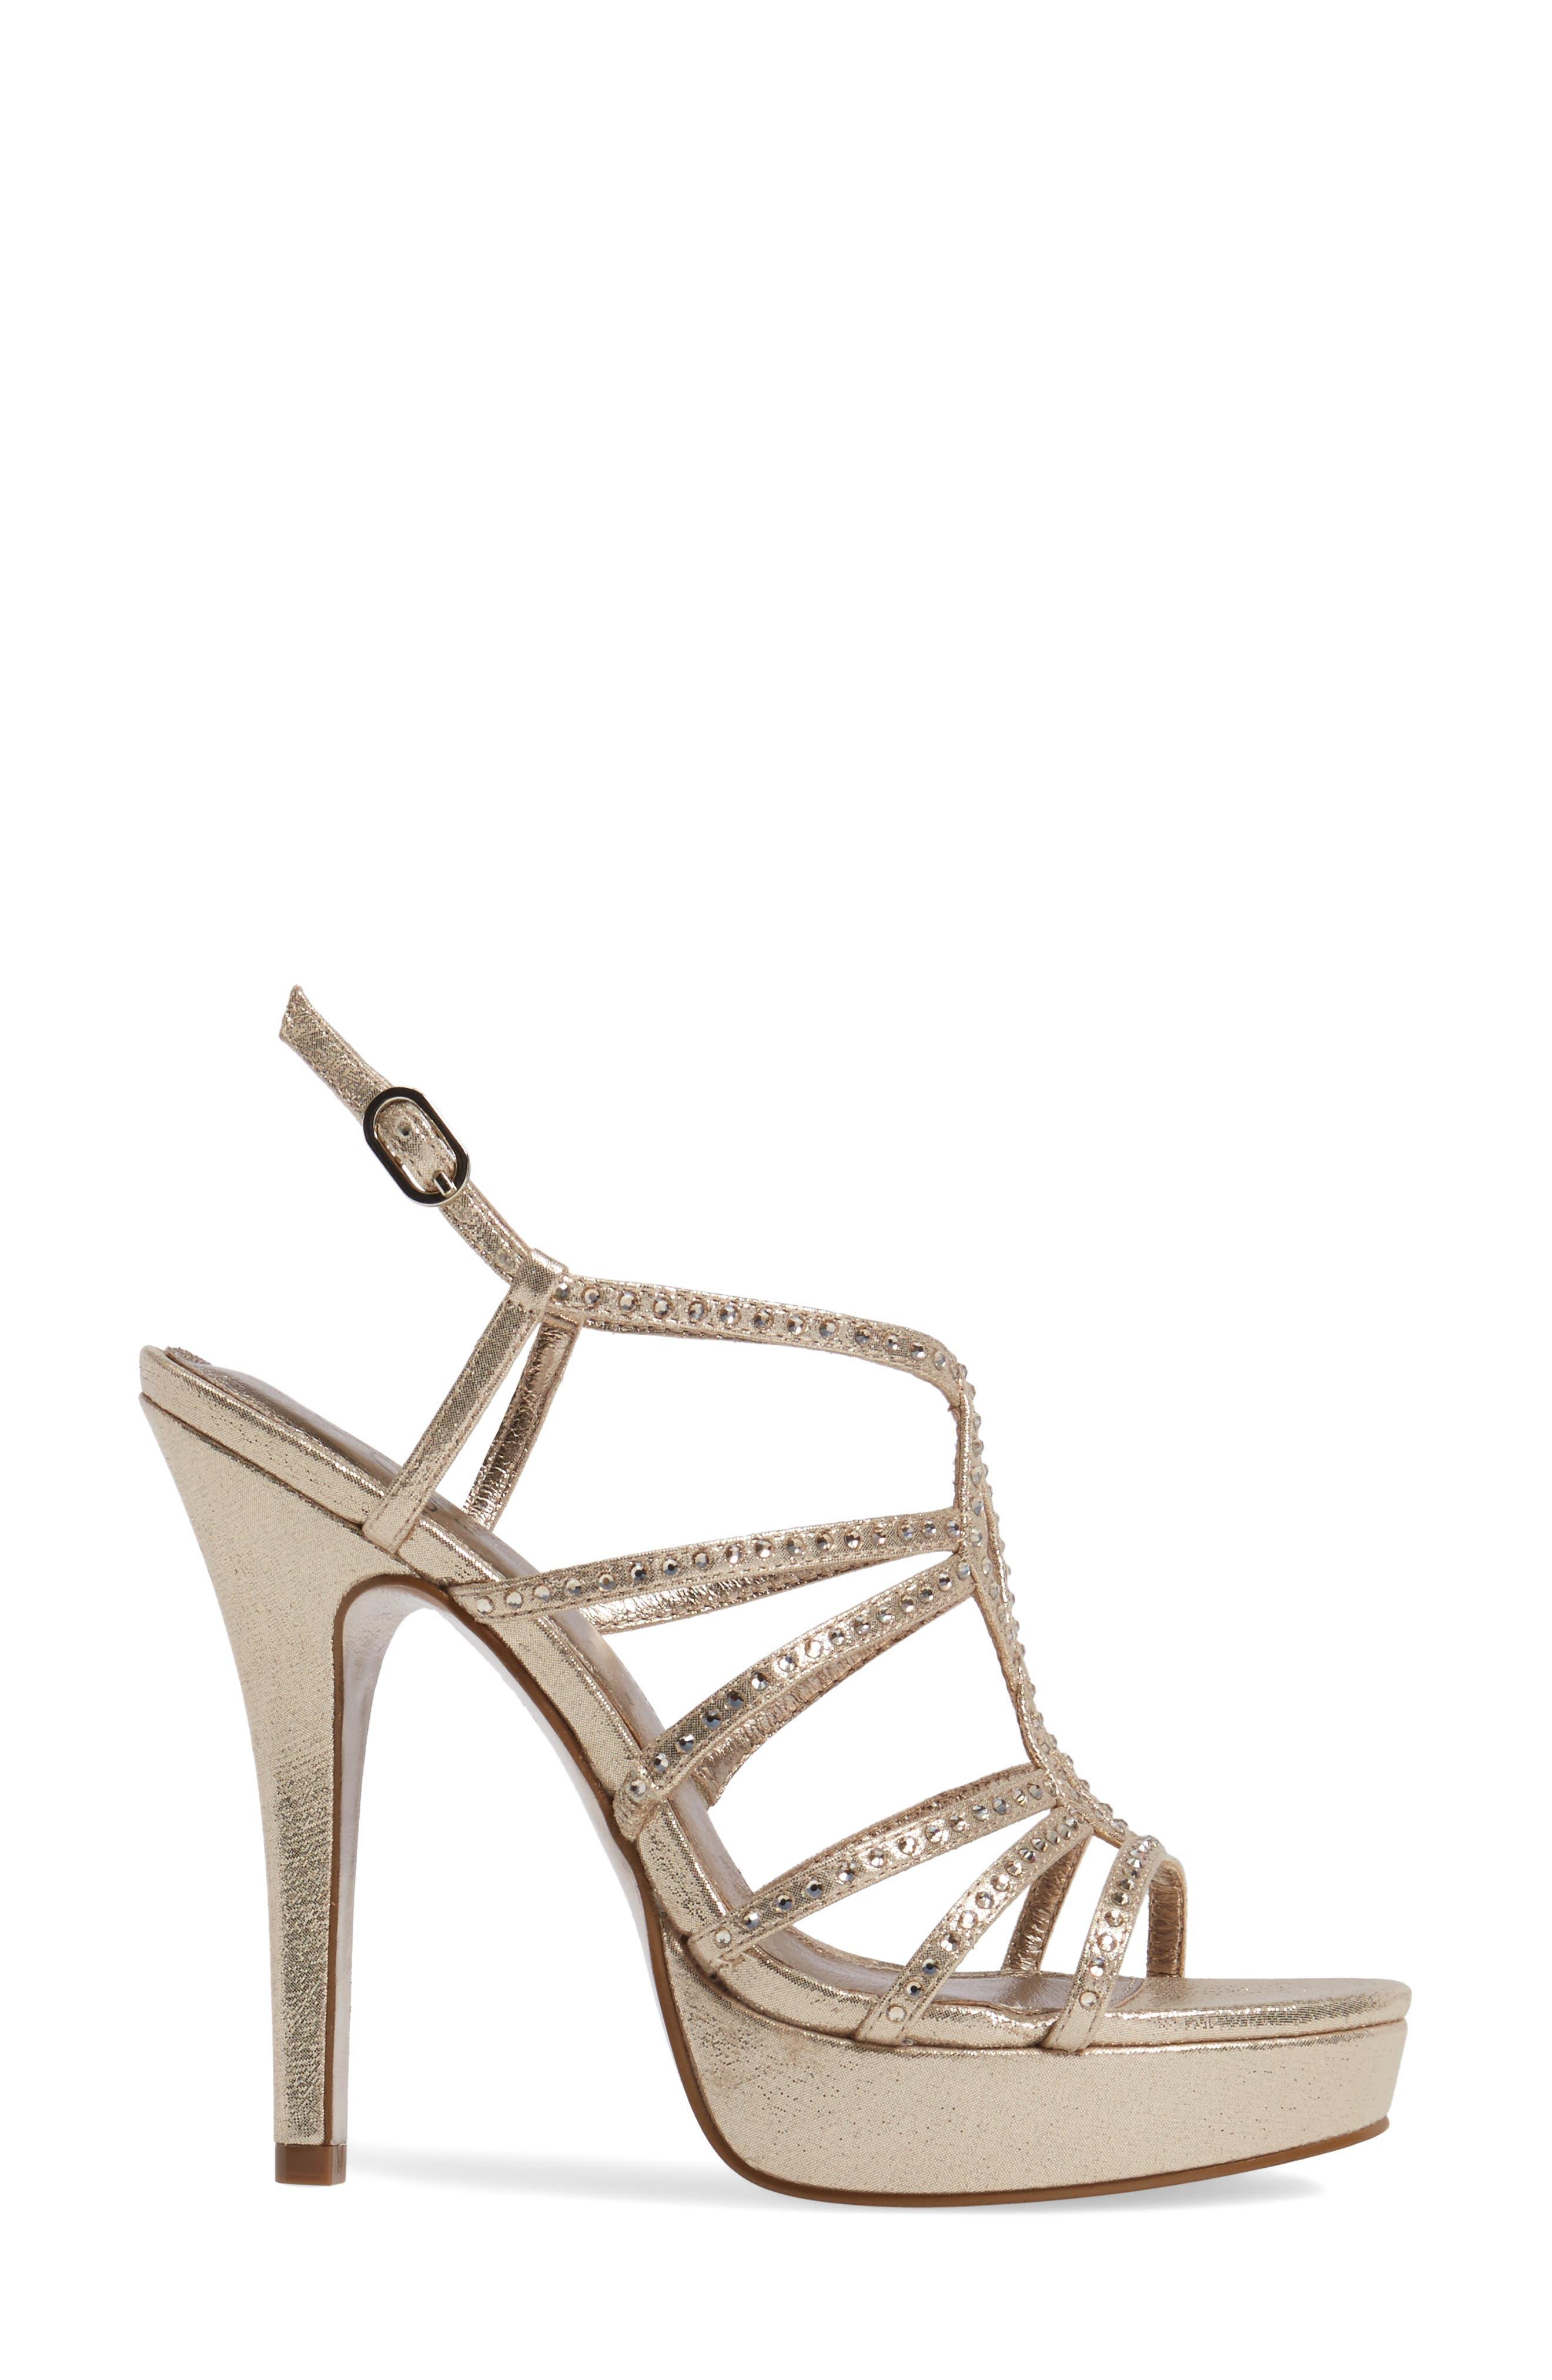 Miranda Embellished Platform Sandal,                             Alternate thumbnail 3, color,                             Gold Metallic Fabric